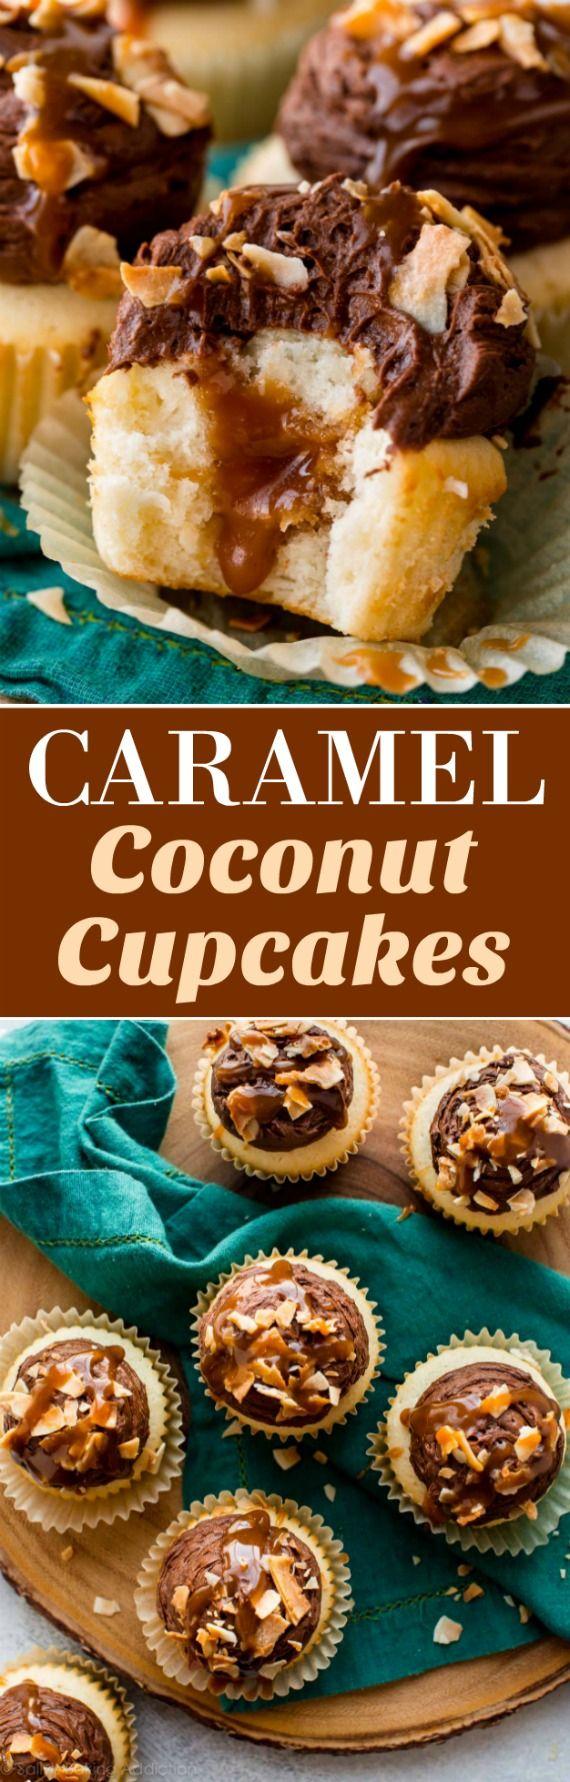 Best 25+ Chocolate caramel cupcakes ideas on Pinterest ...